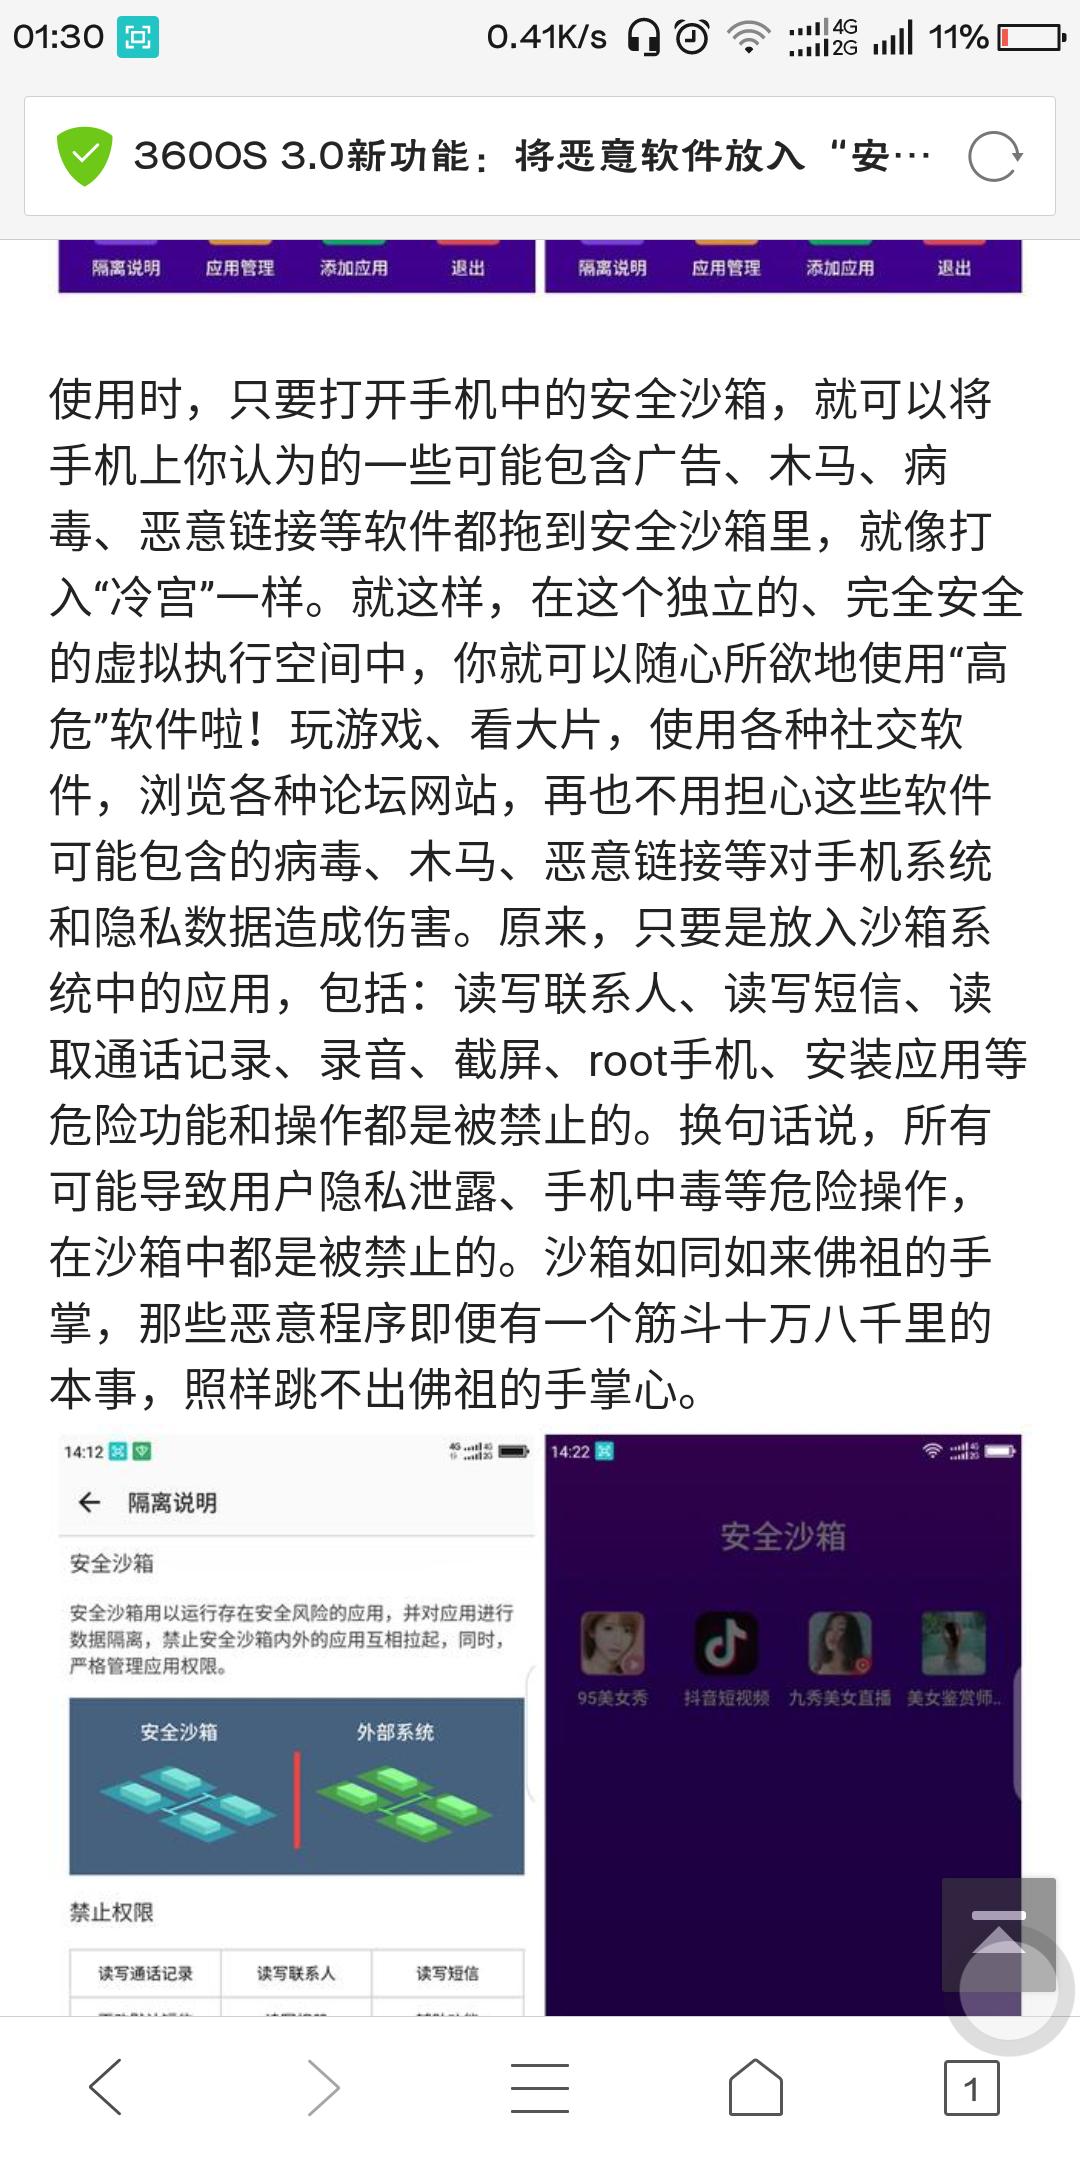 Screenshot_2018-08-11-01-30-55.png